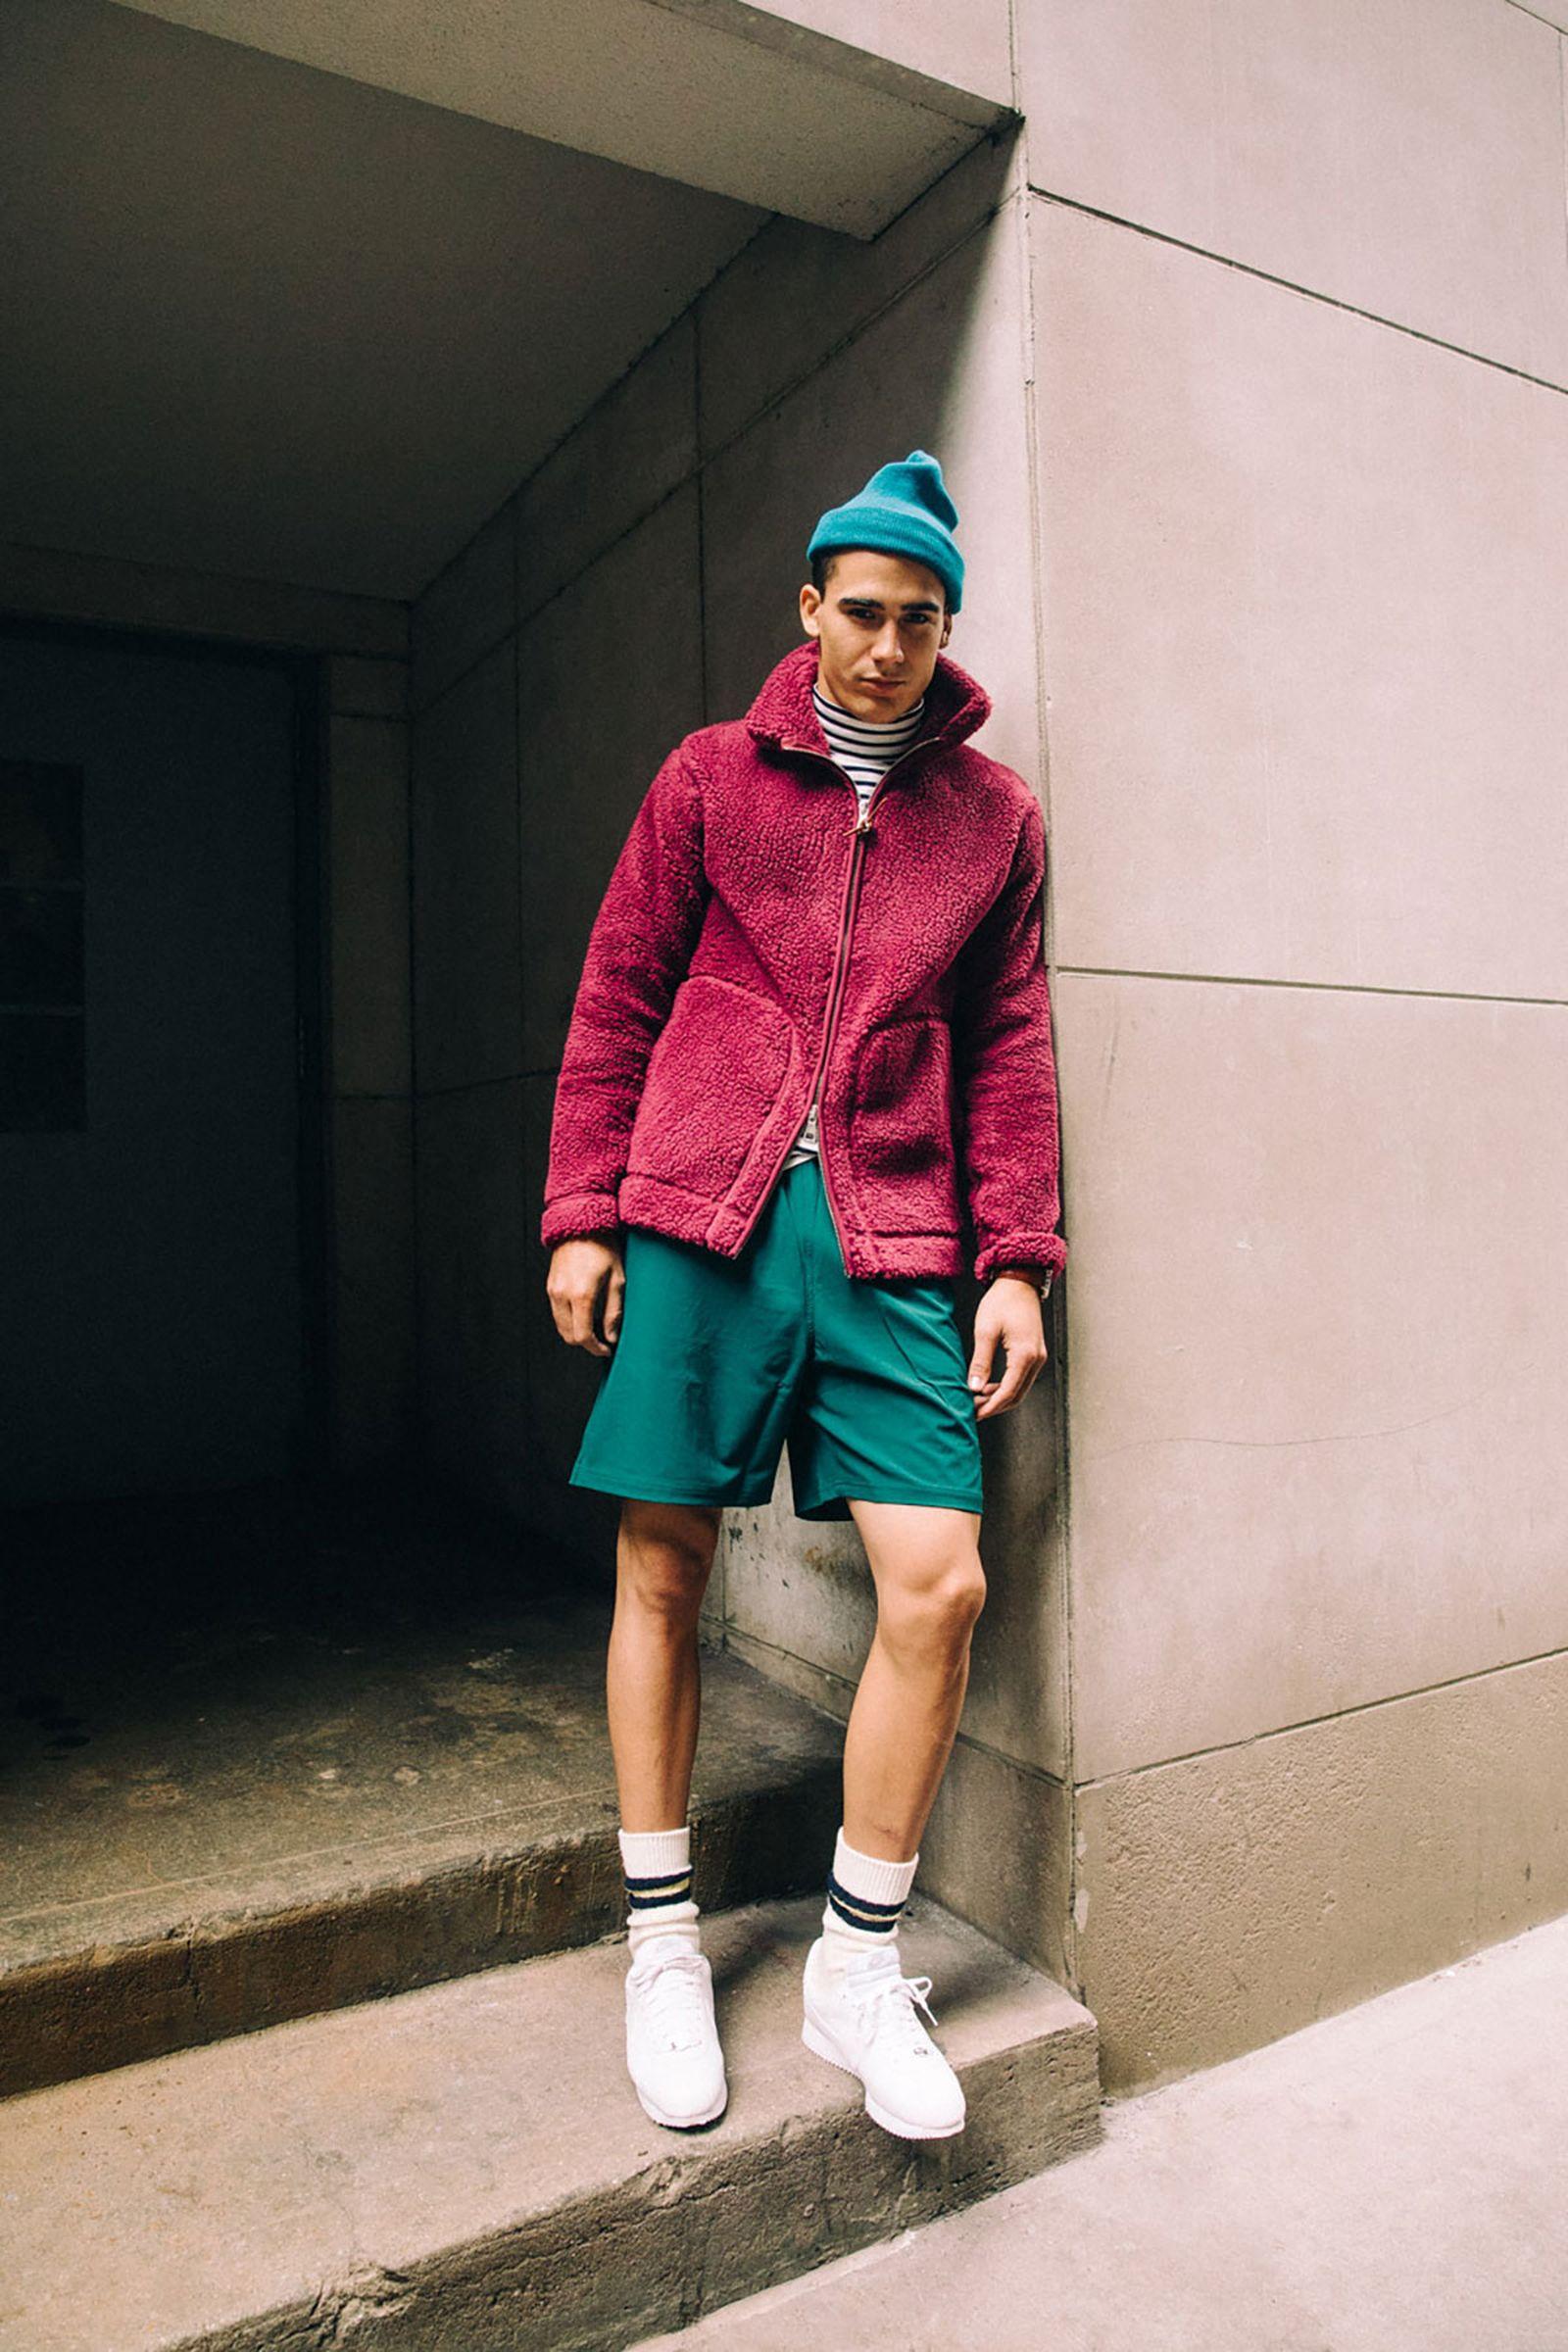 Prep editorial highsnobiety Gucci Ralph Lauren fashion story